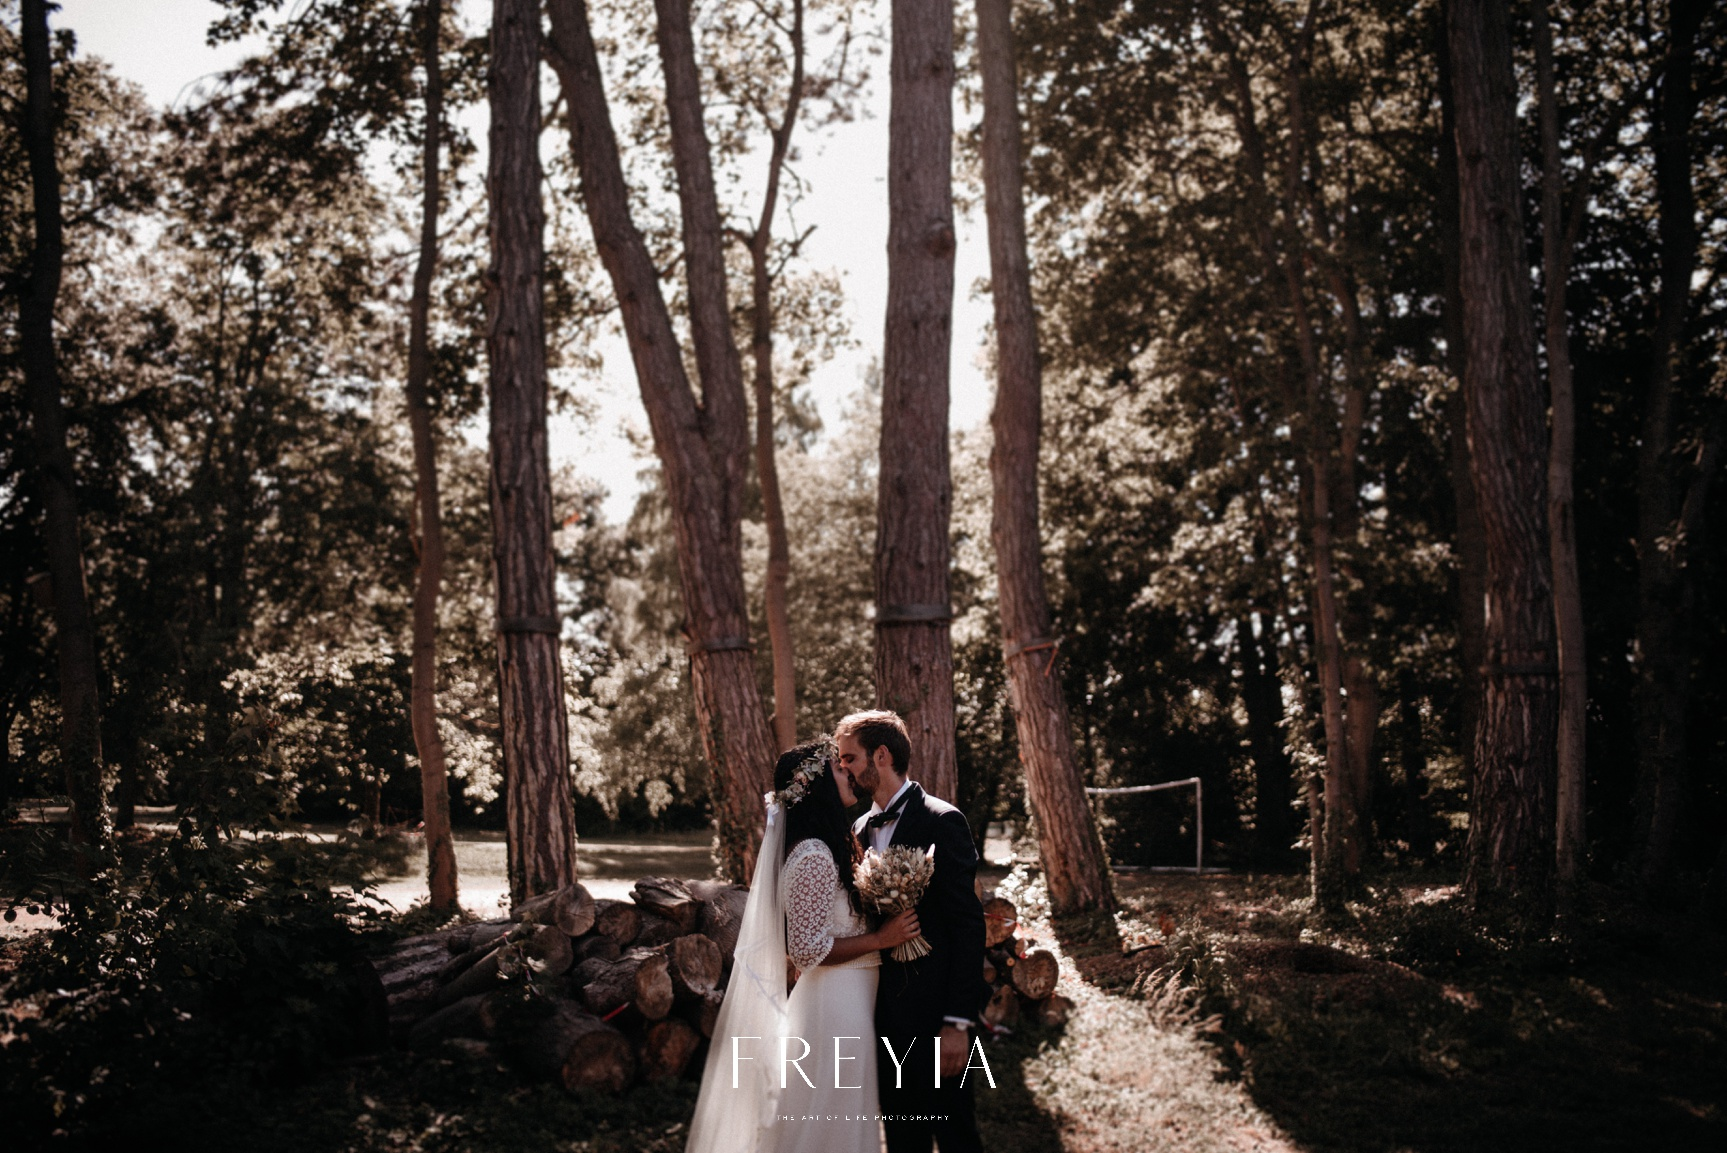 R + T |  mariage reportage alternatif moody intime minimaliste vintage naturel boho boheme |  PHOTOGRAPHE mariage PARIS france destination  | FREYIA photography_-218.jpg